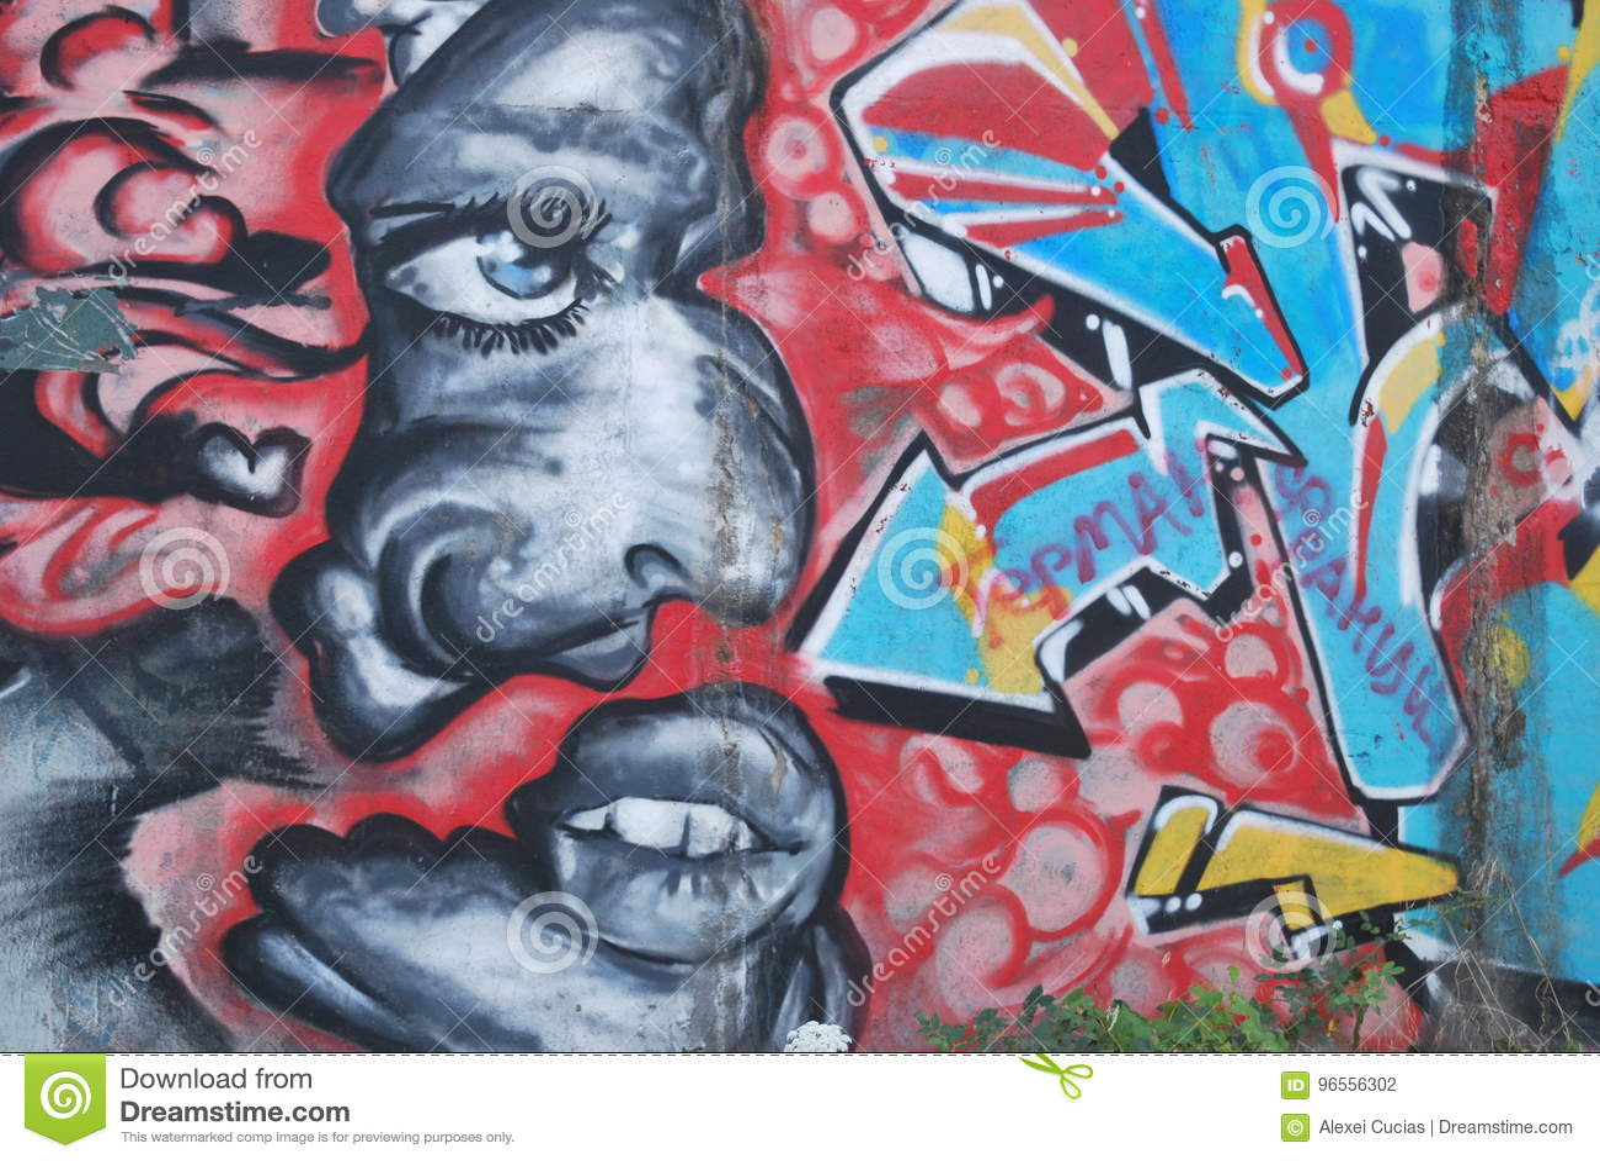 A bridge vandalized with street graffiti art